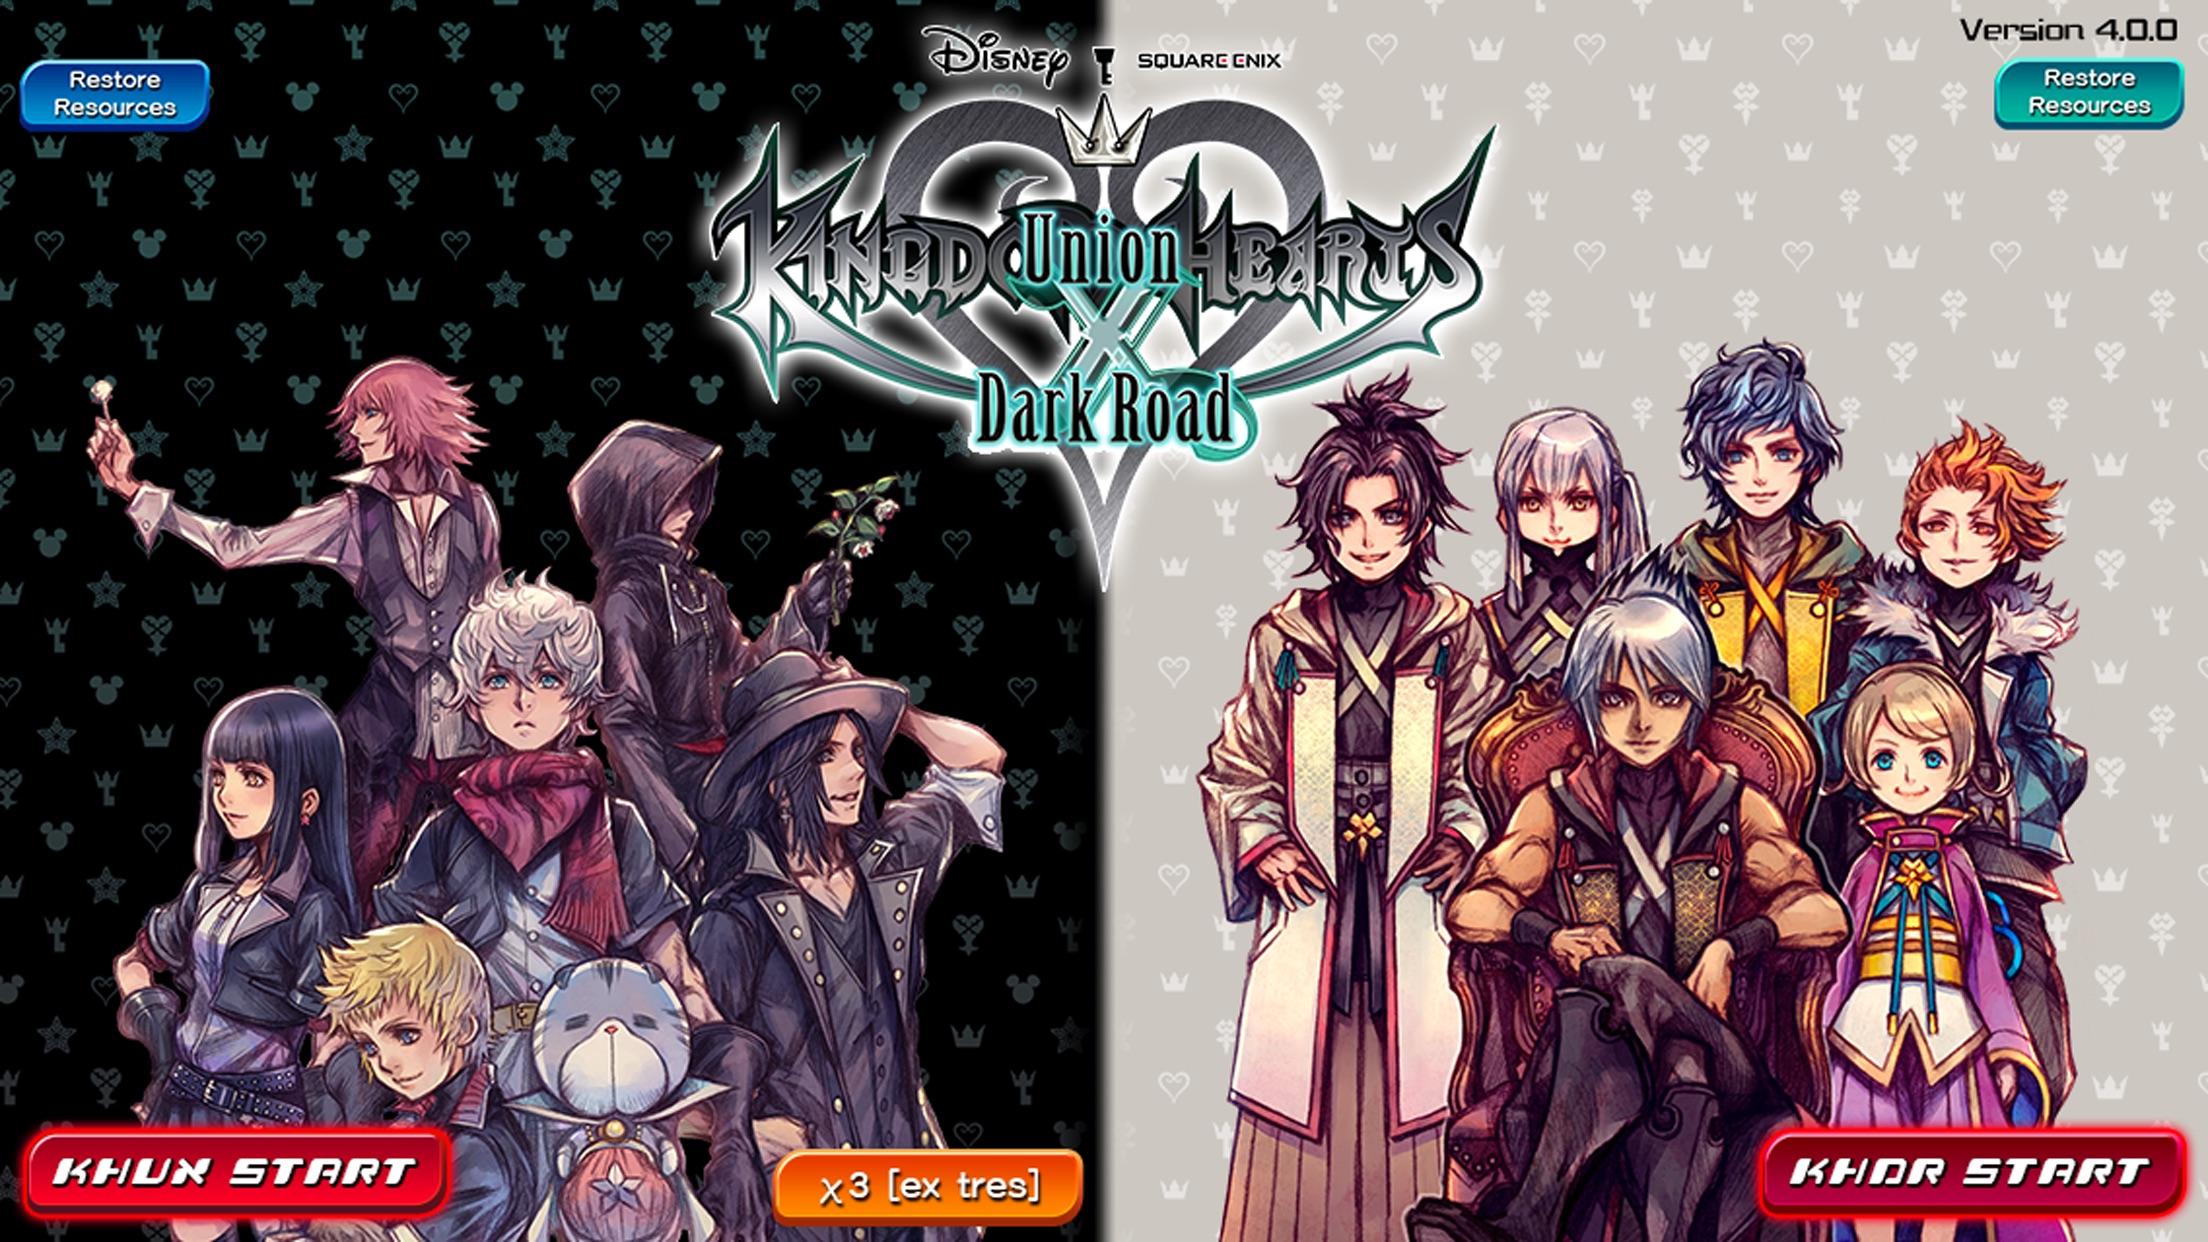 KINGDOM HEARTS Uχ Dark Road Screenshot